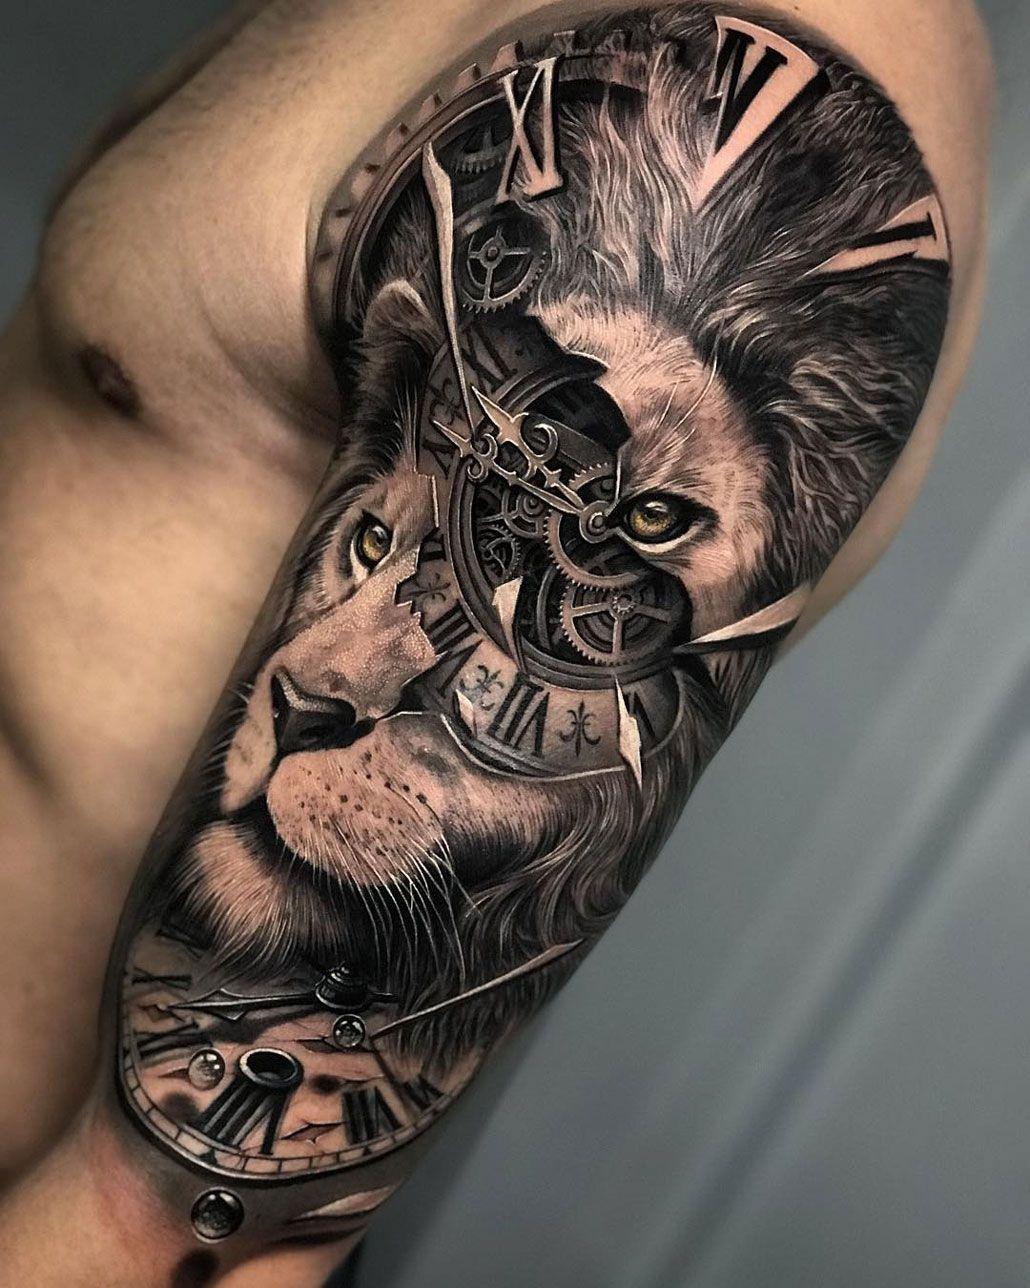 125 Best Lion Tattoos For Men Cool Designs Ideas 2020 Guide Mens Lion Tattoo Lion Tattoo Tattoos For Guys